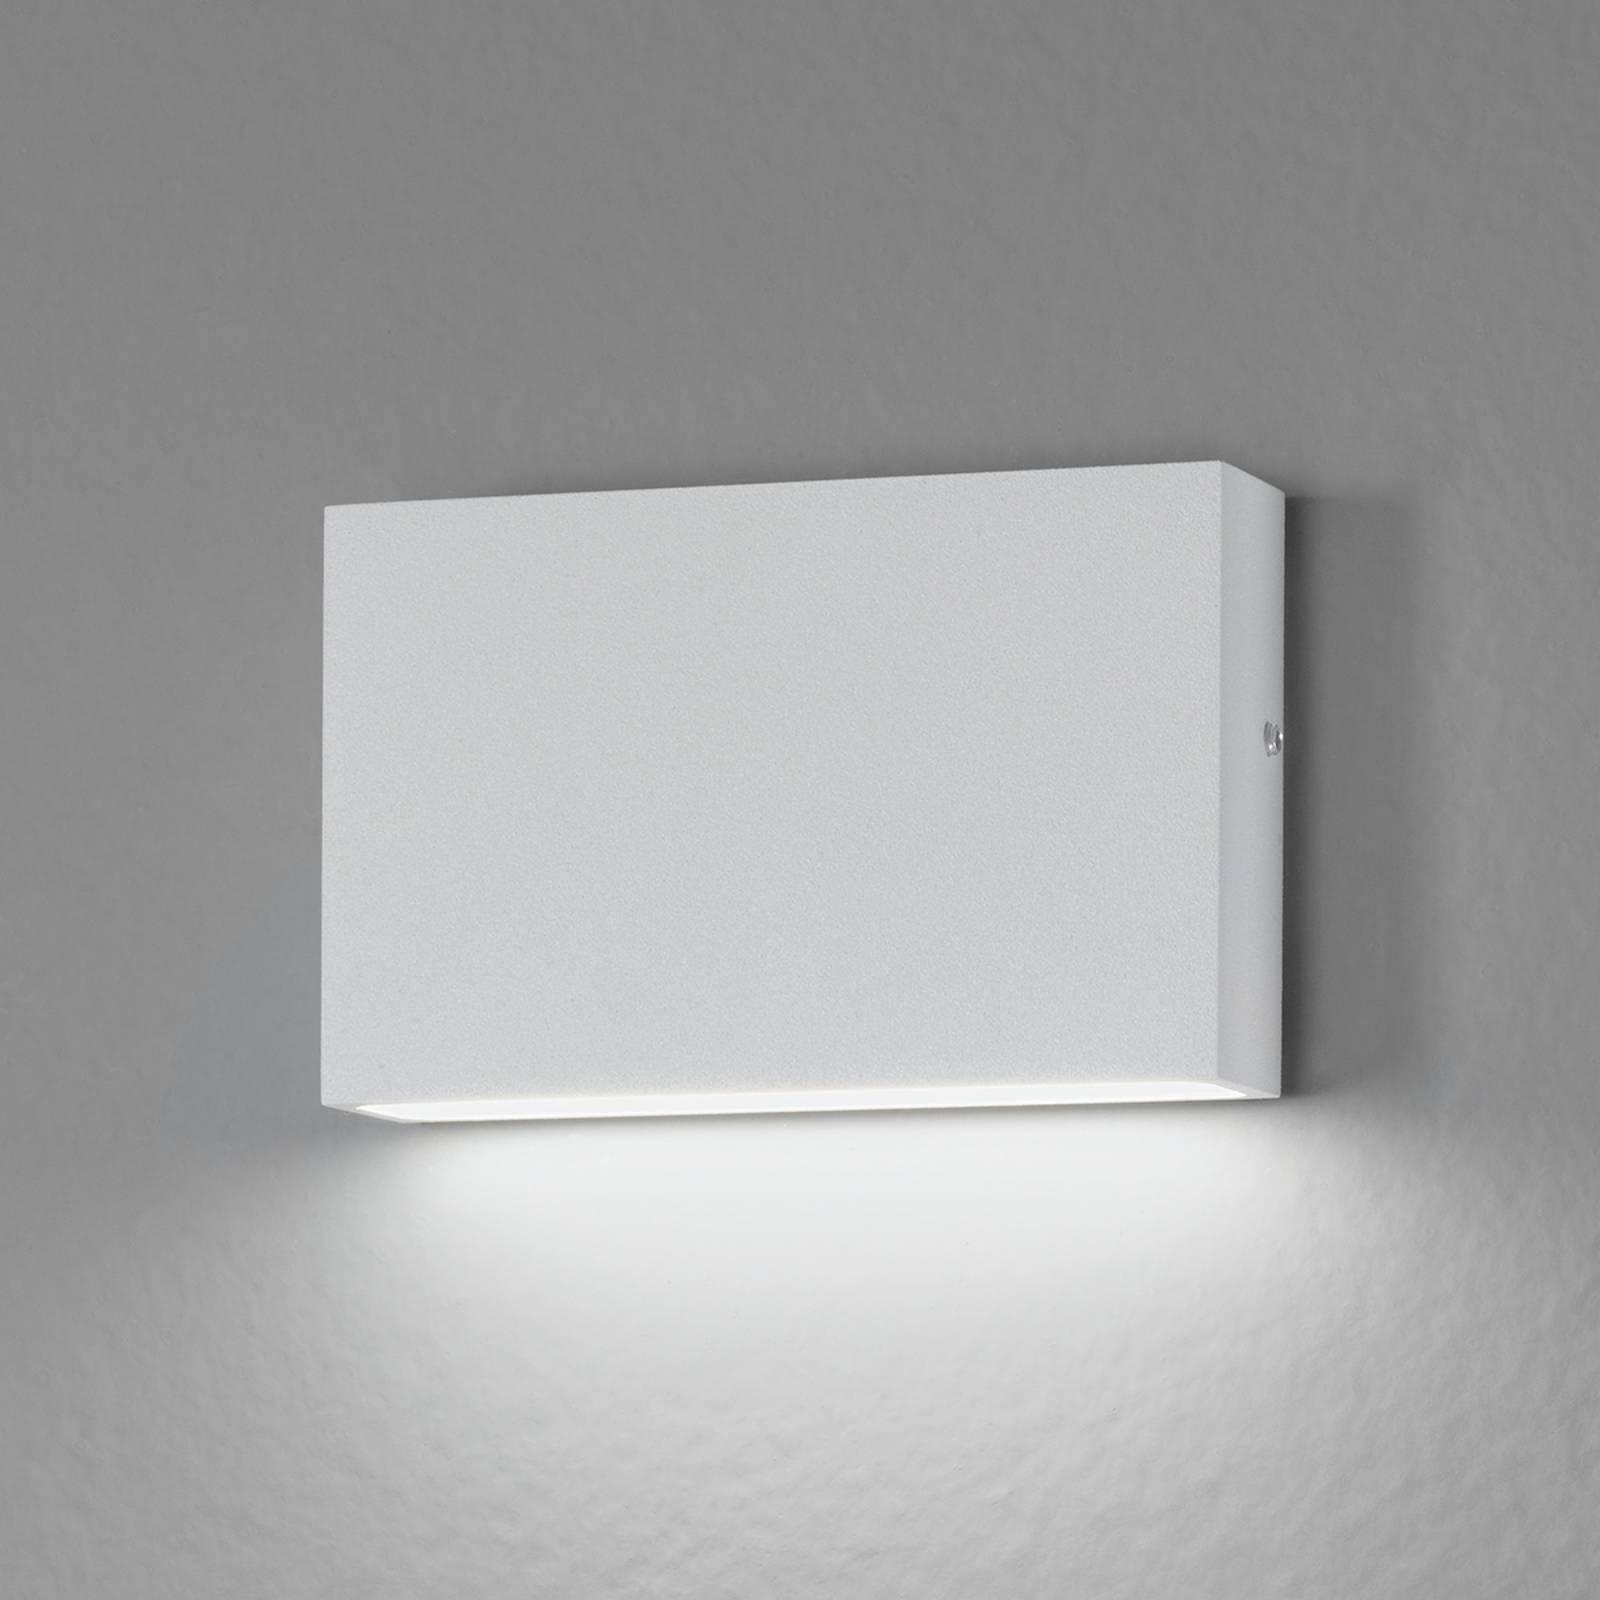 wandbeleuchtung von egger licht bei i love. Black Bedroom Furniture Sets. Home Design Ideas